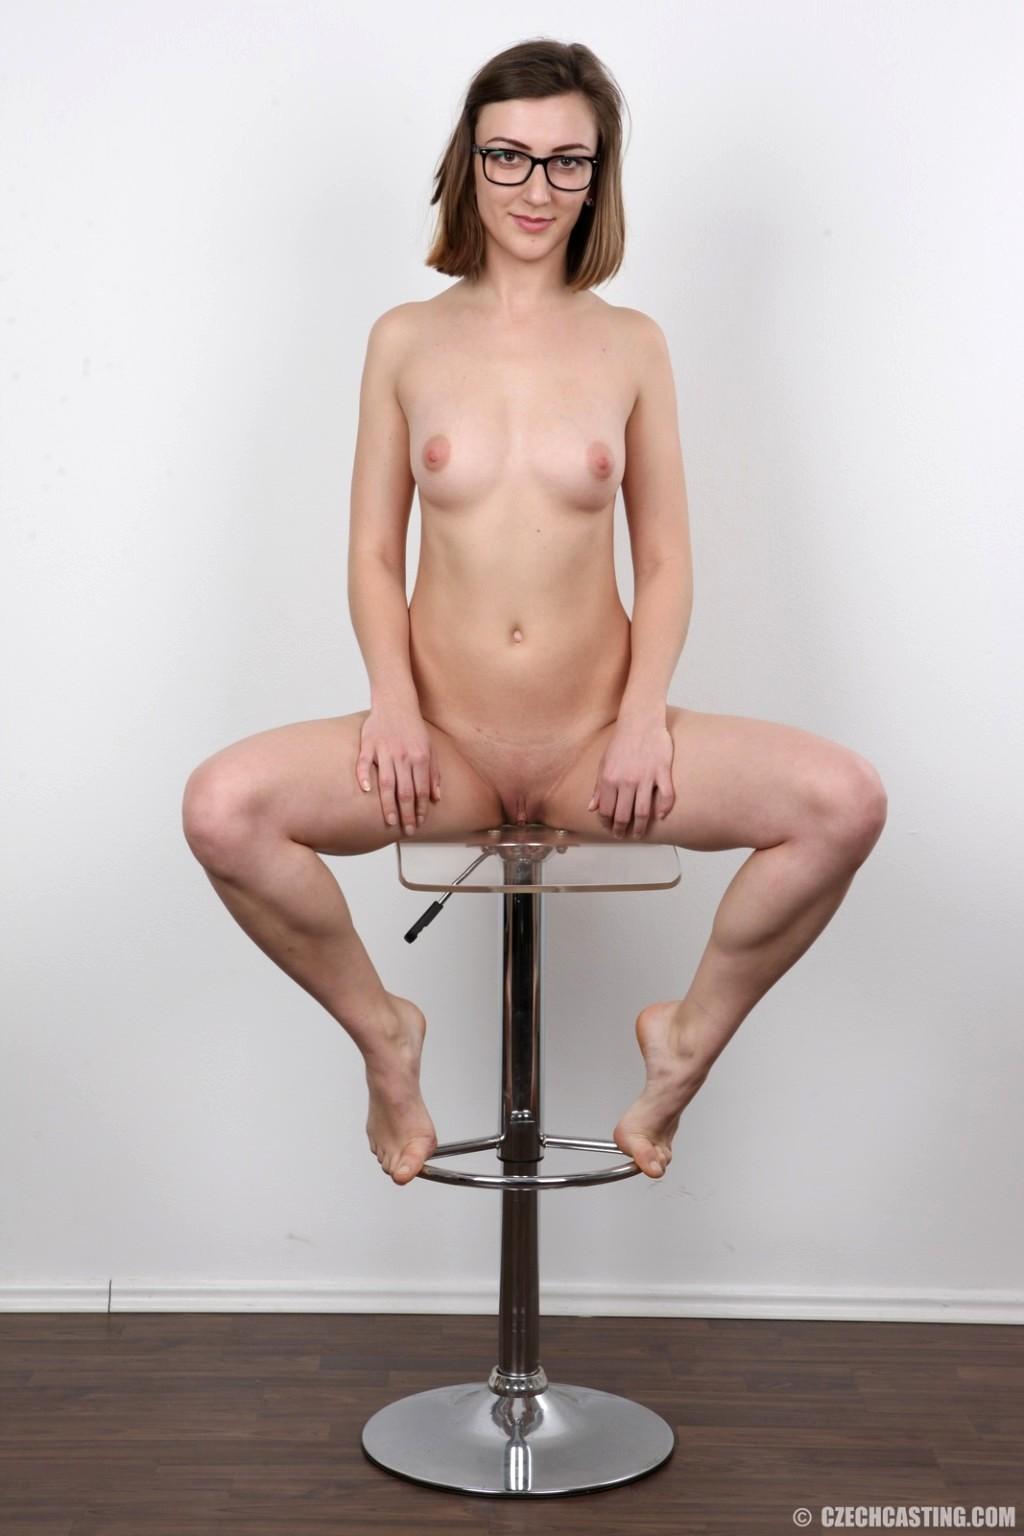 Nude pics of jimmy fallon